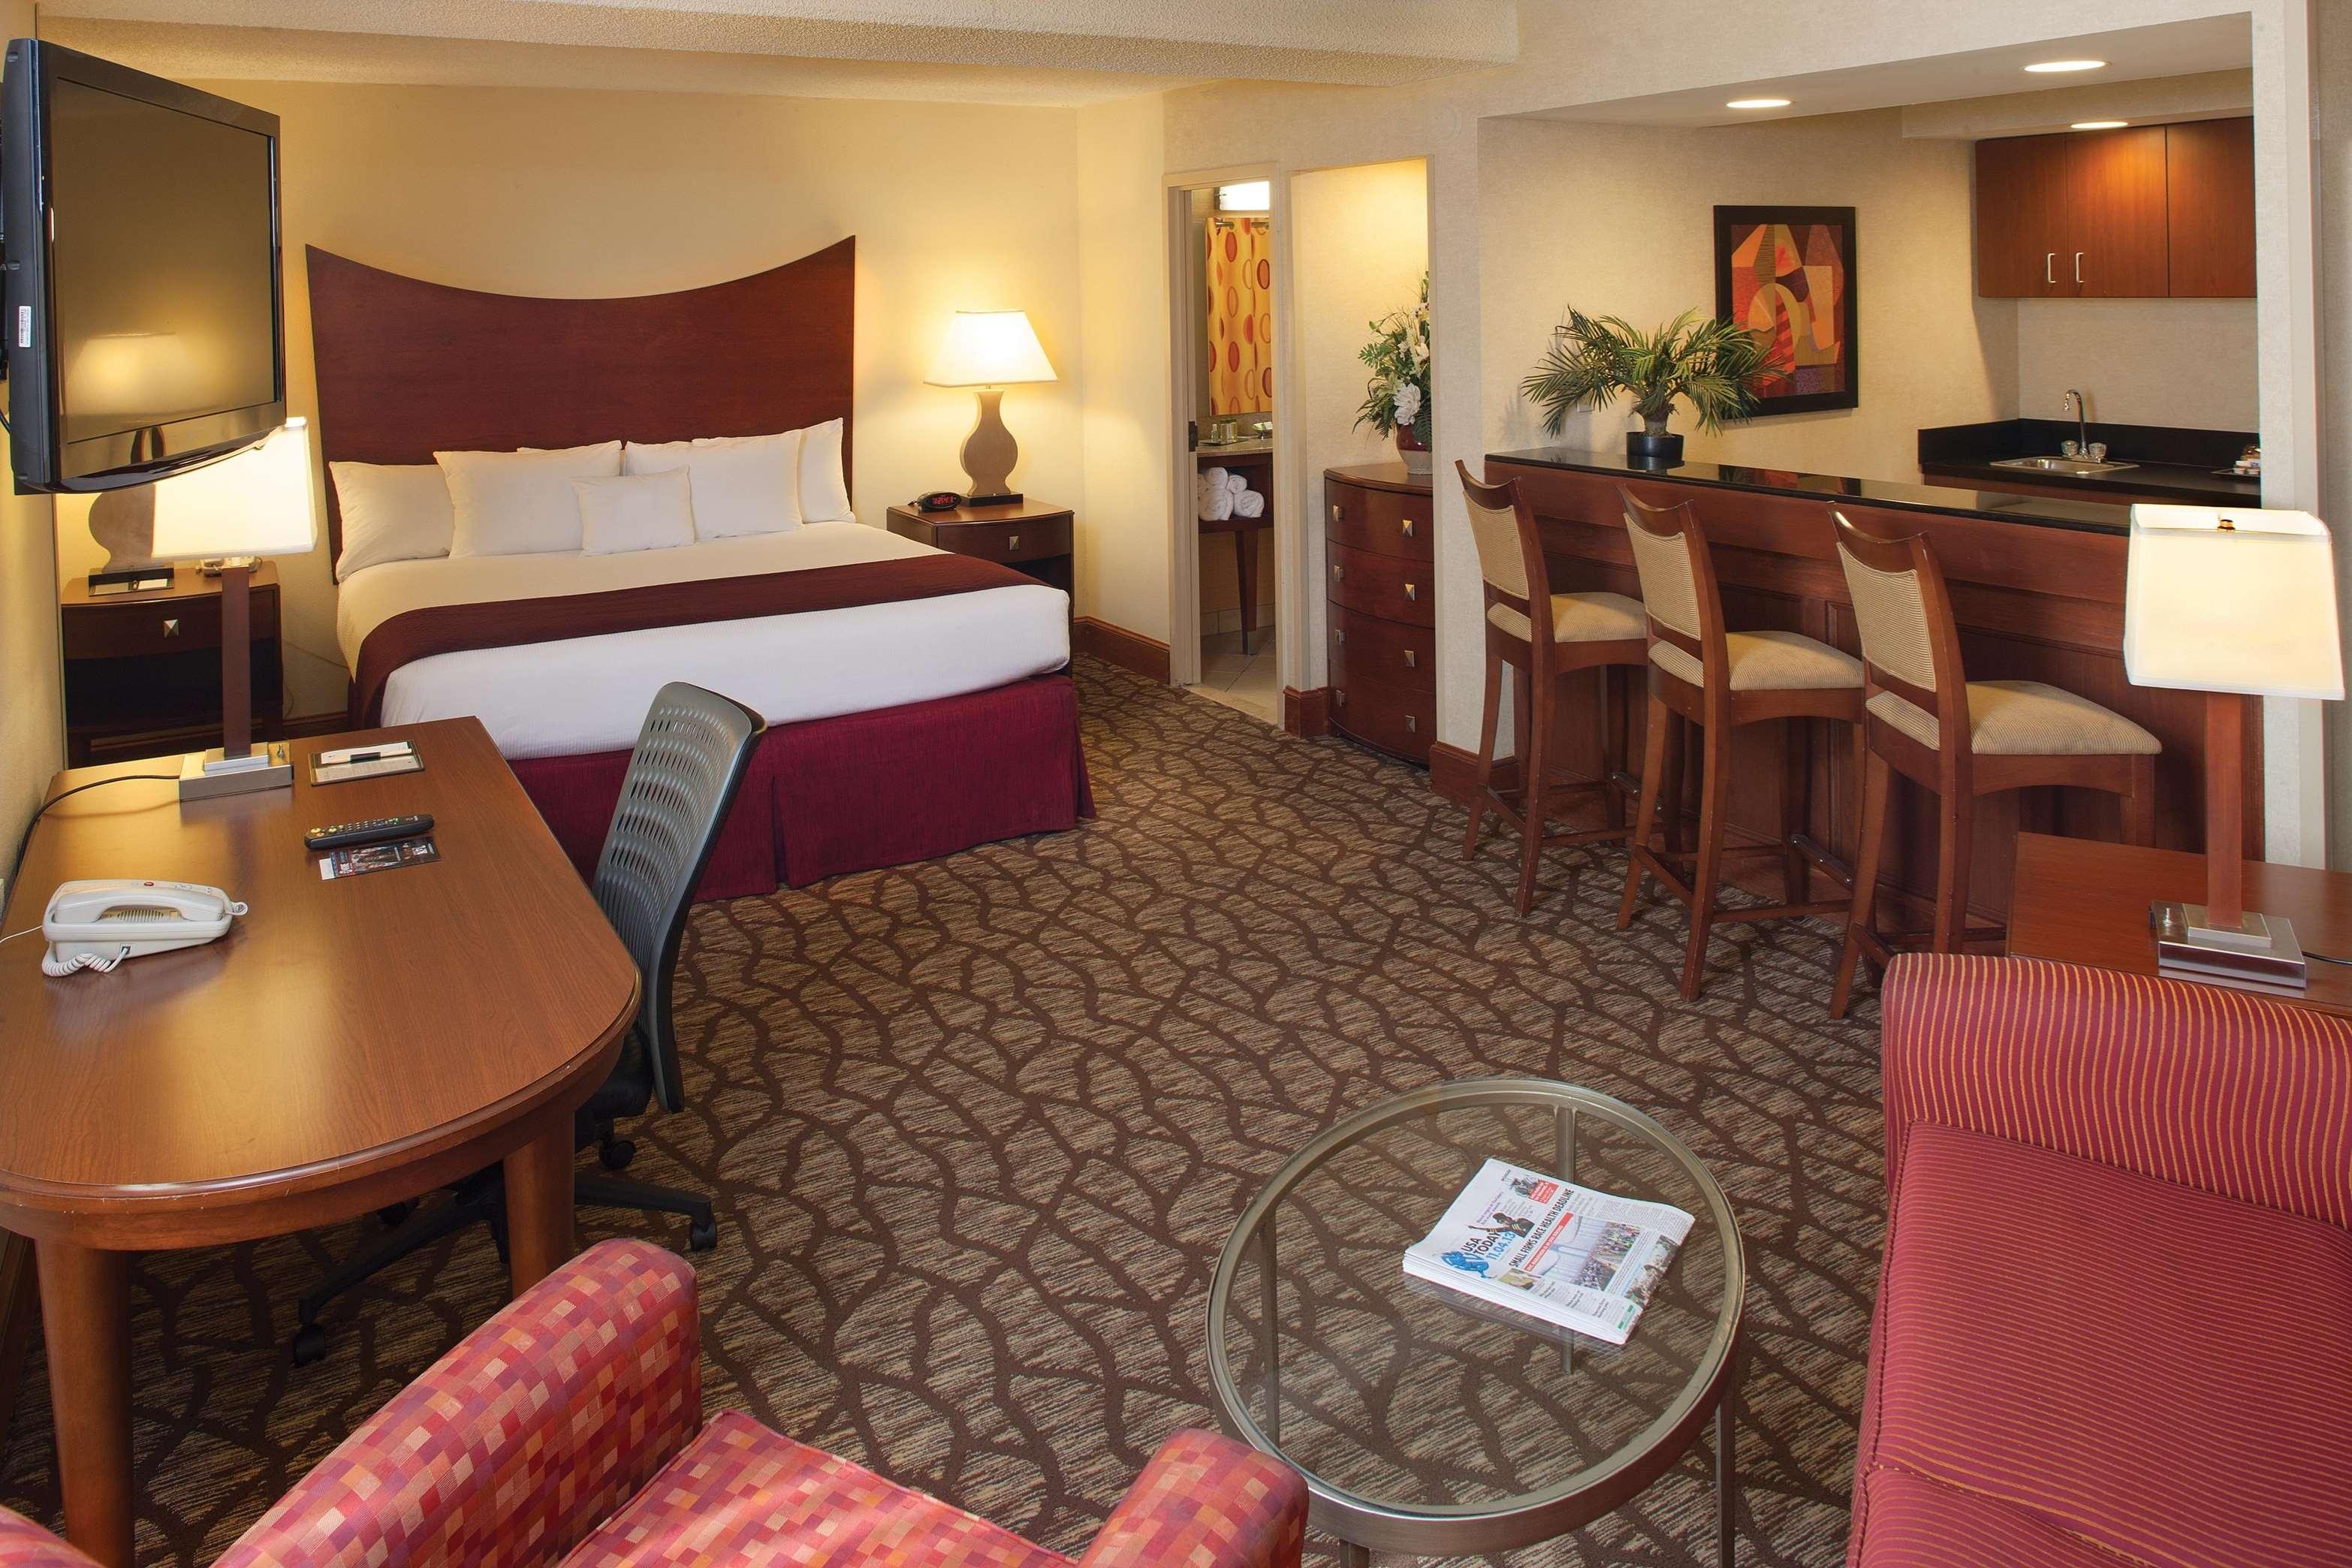 DoubleTree by Hilton Hotel Oak Ridge - Knoxville image 26